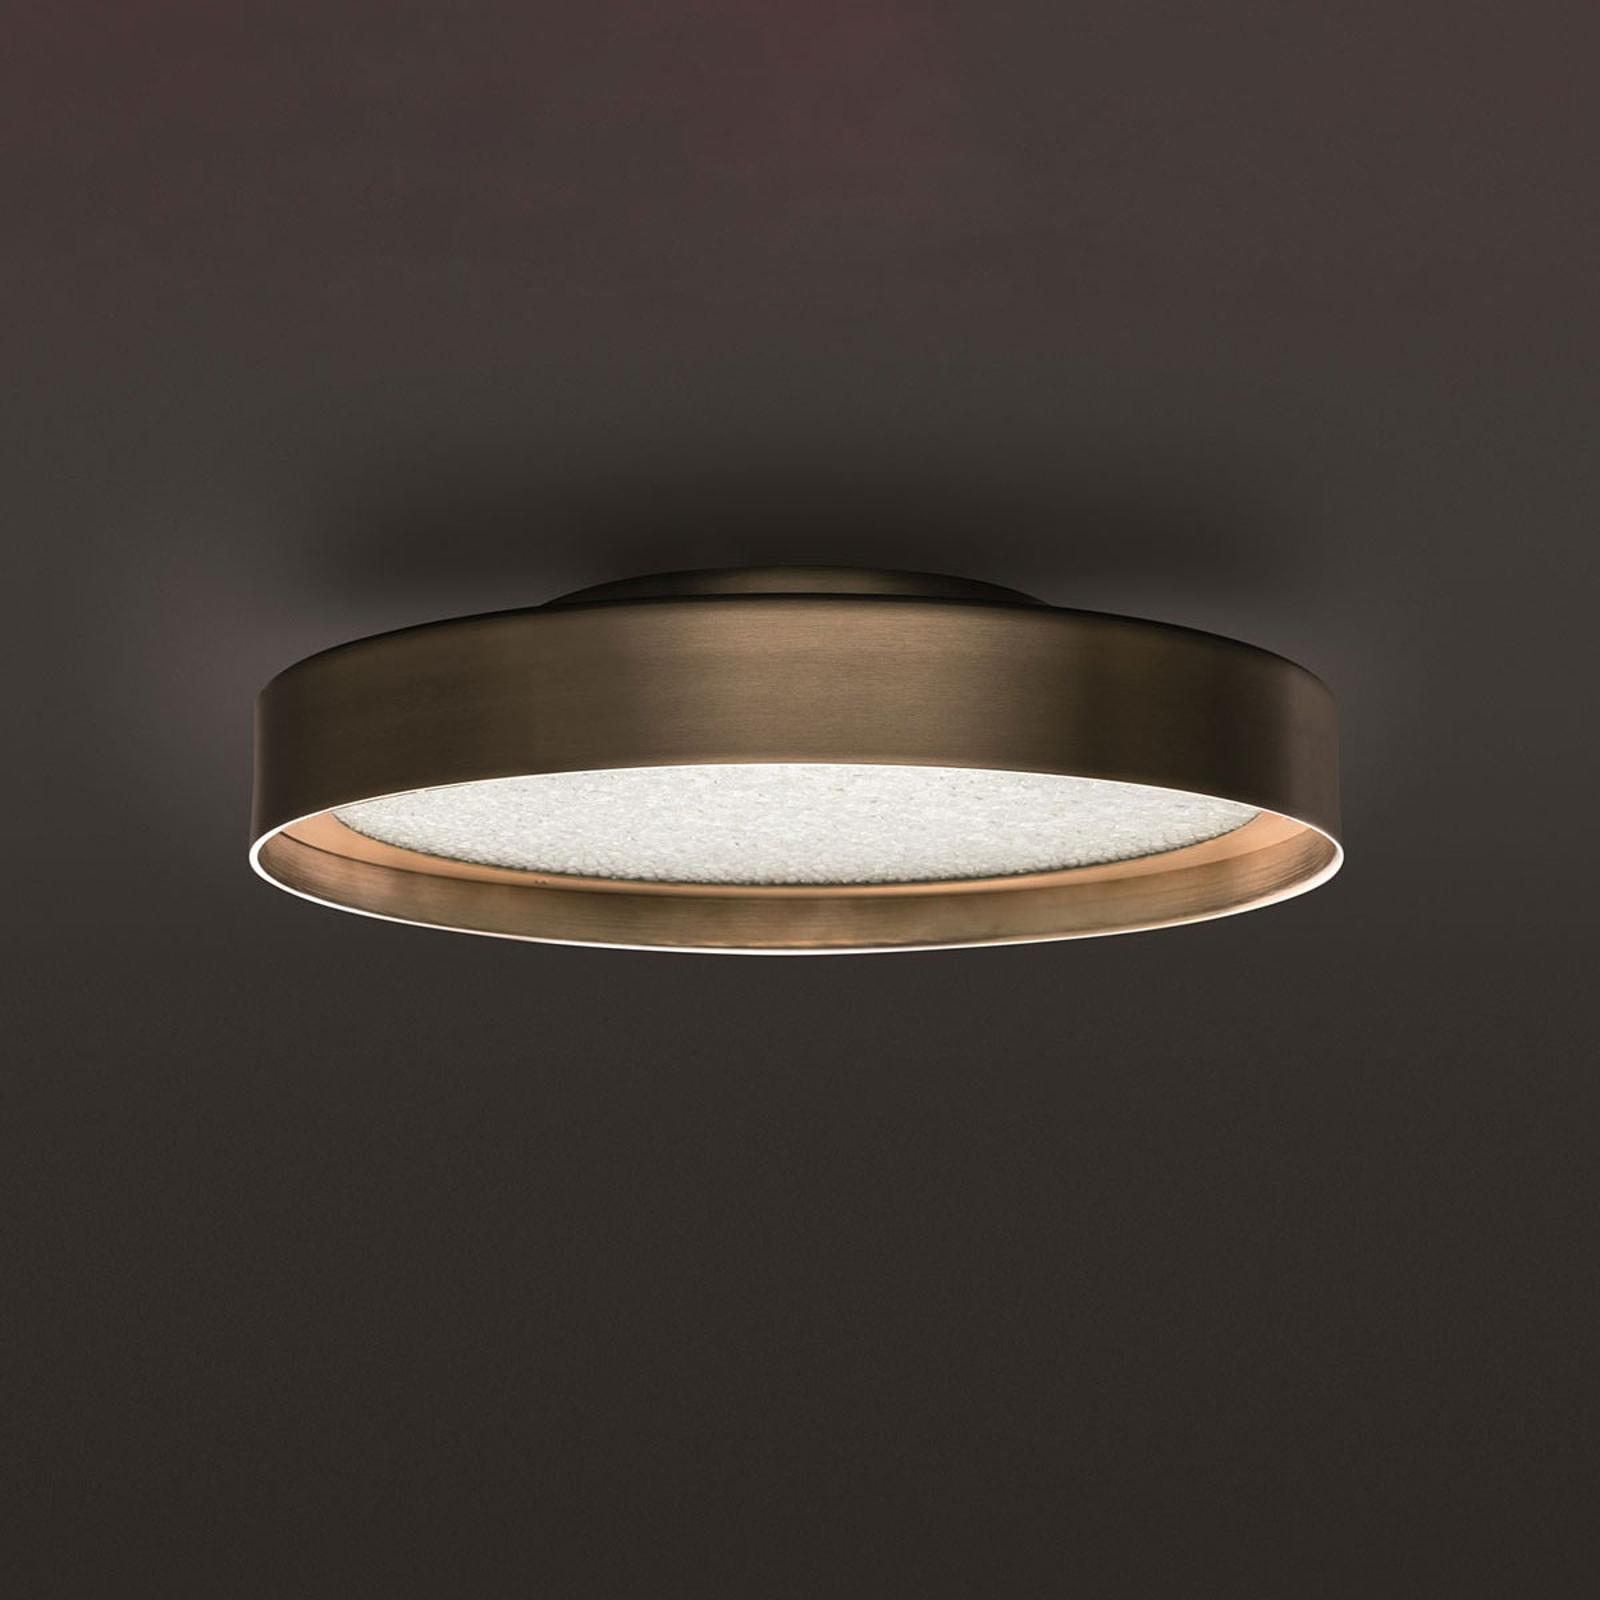 Oluce Berlin lampa sufitowa, średnica 30 cm